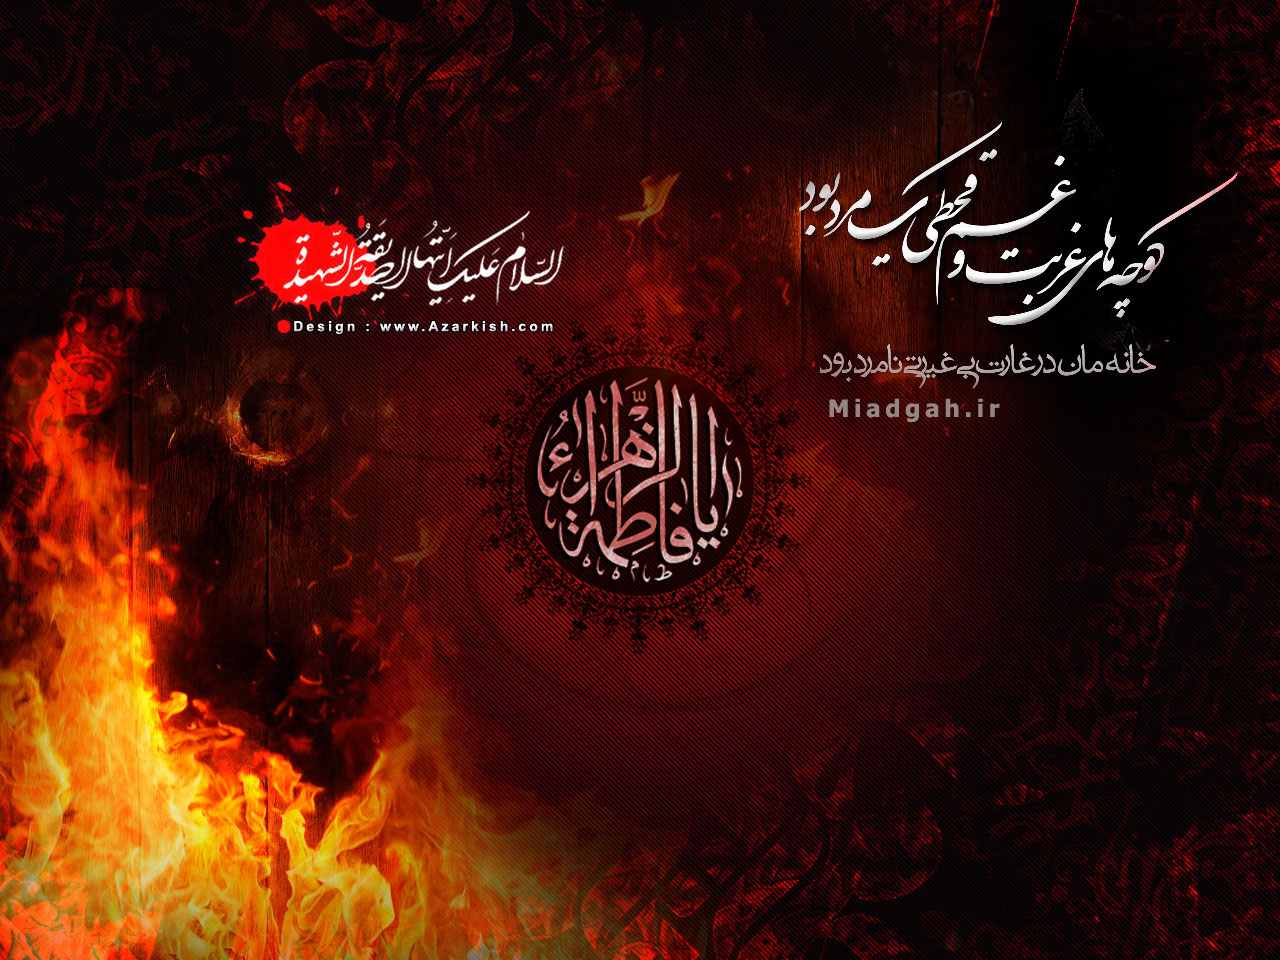 شهادت حضرت فاطمه زهرا - طرح : محمد آذرکیش